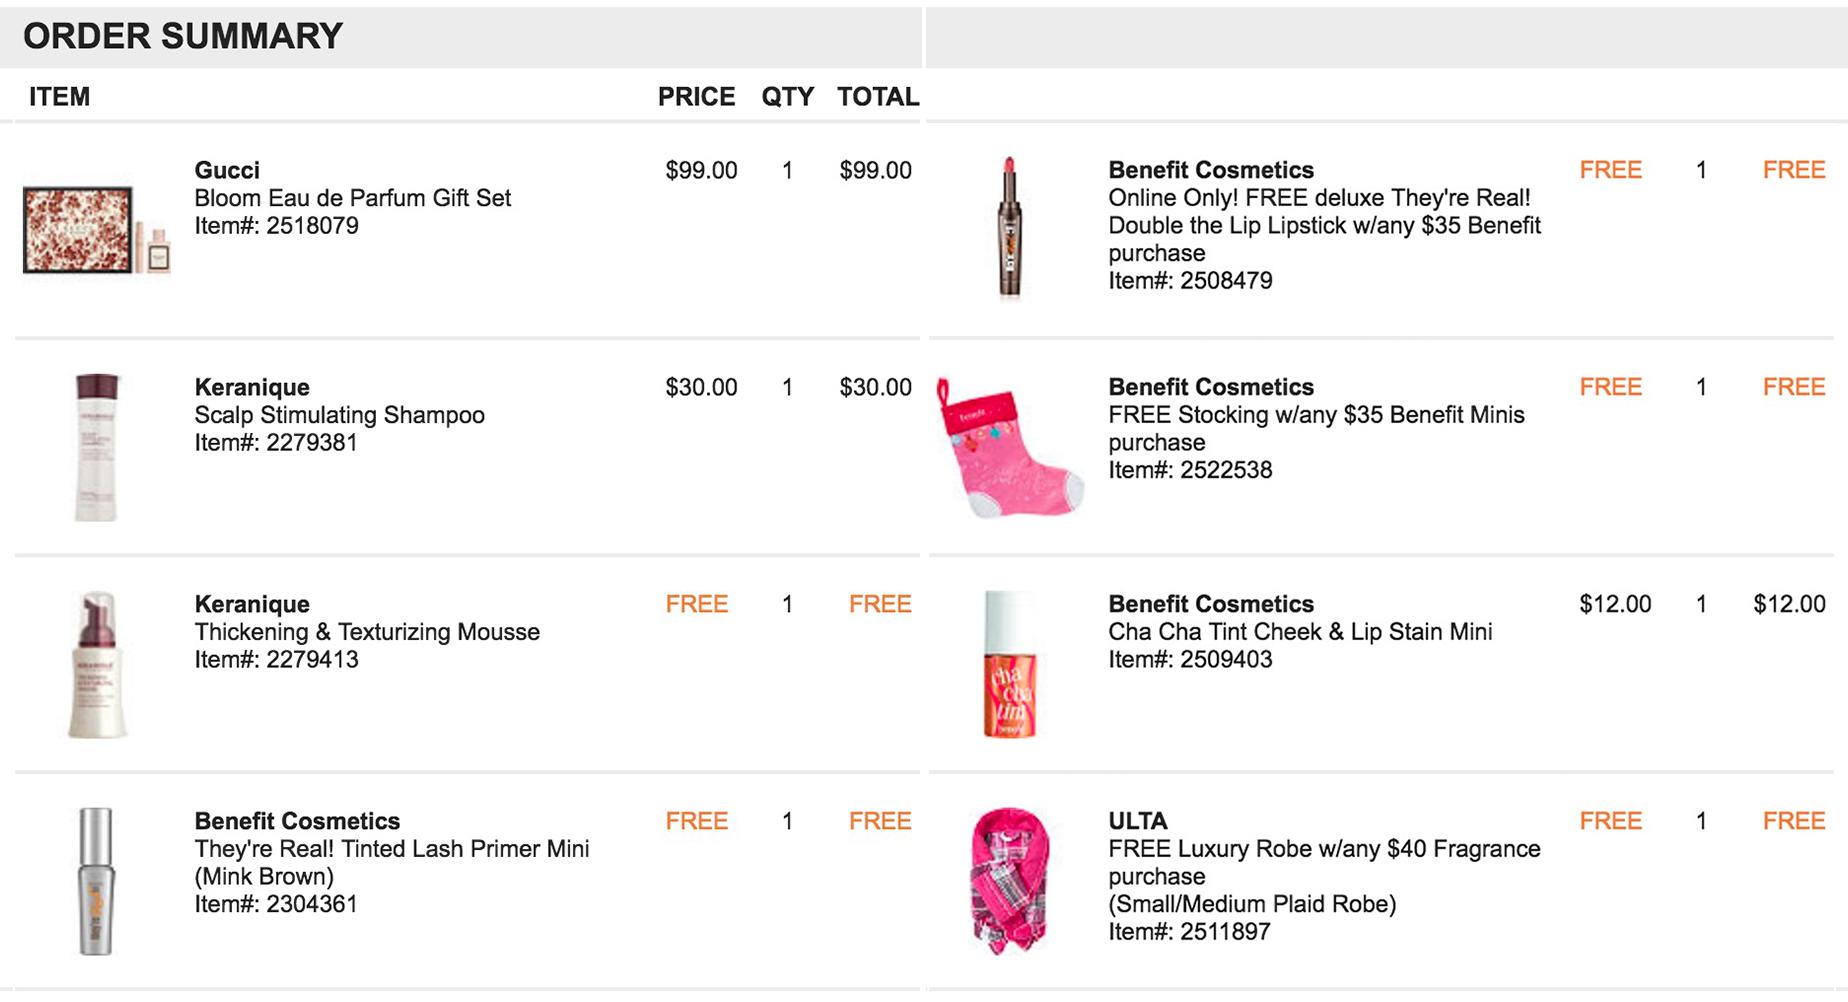 847b527df20 How I Saved $473.98 at ULTA Beauty - Slickdeals.net